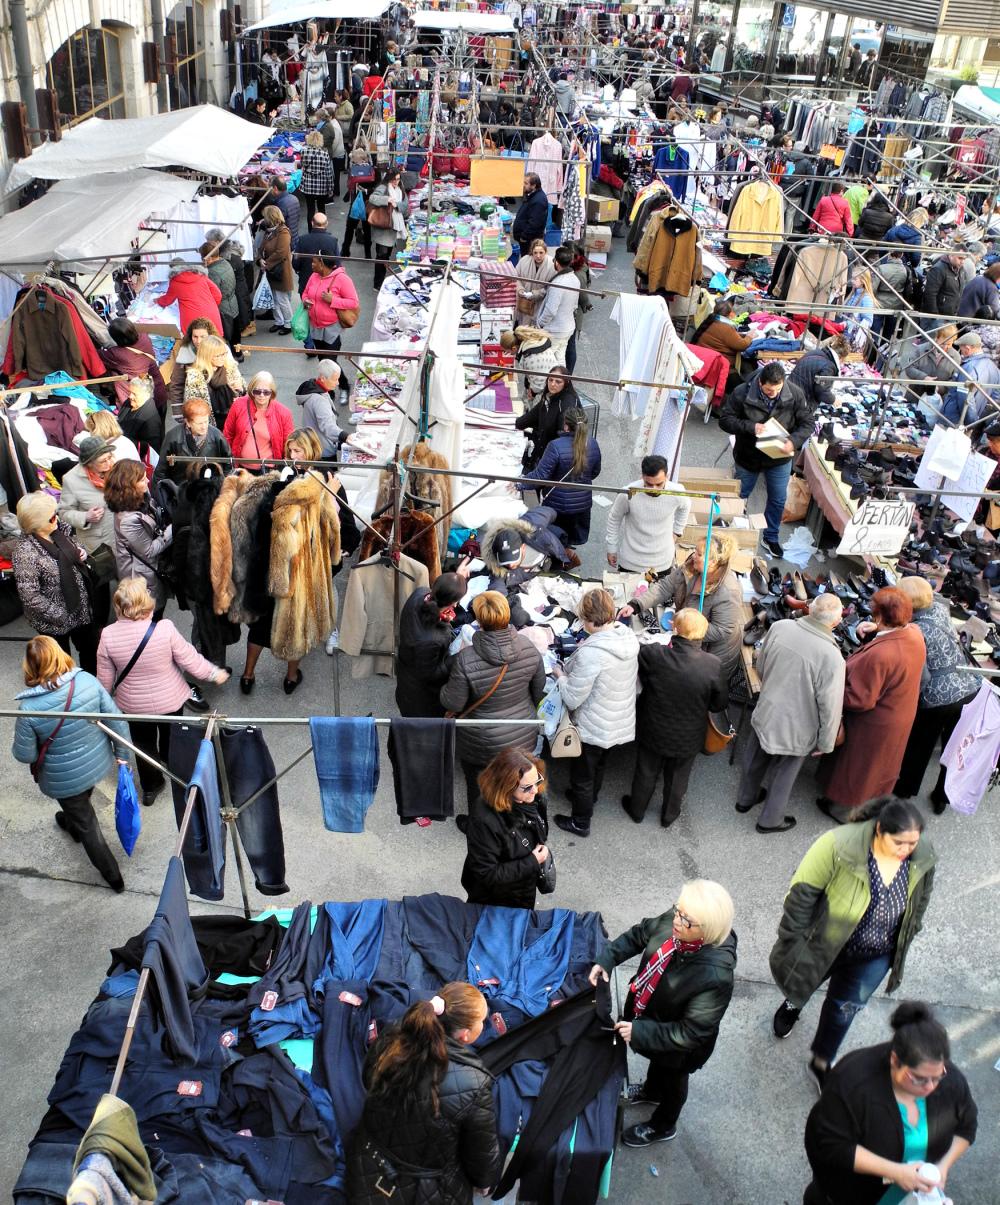 Santander Spain Market